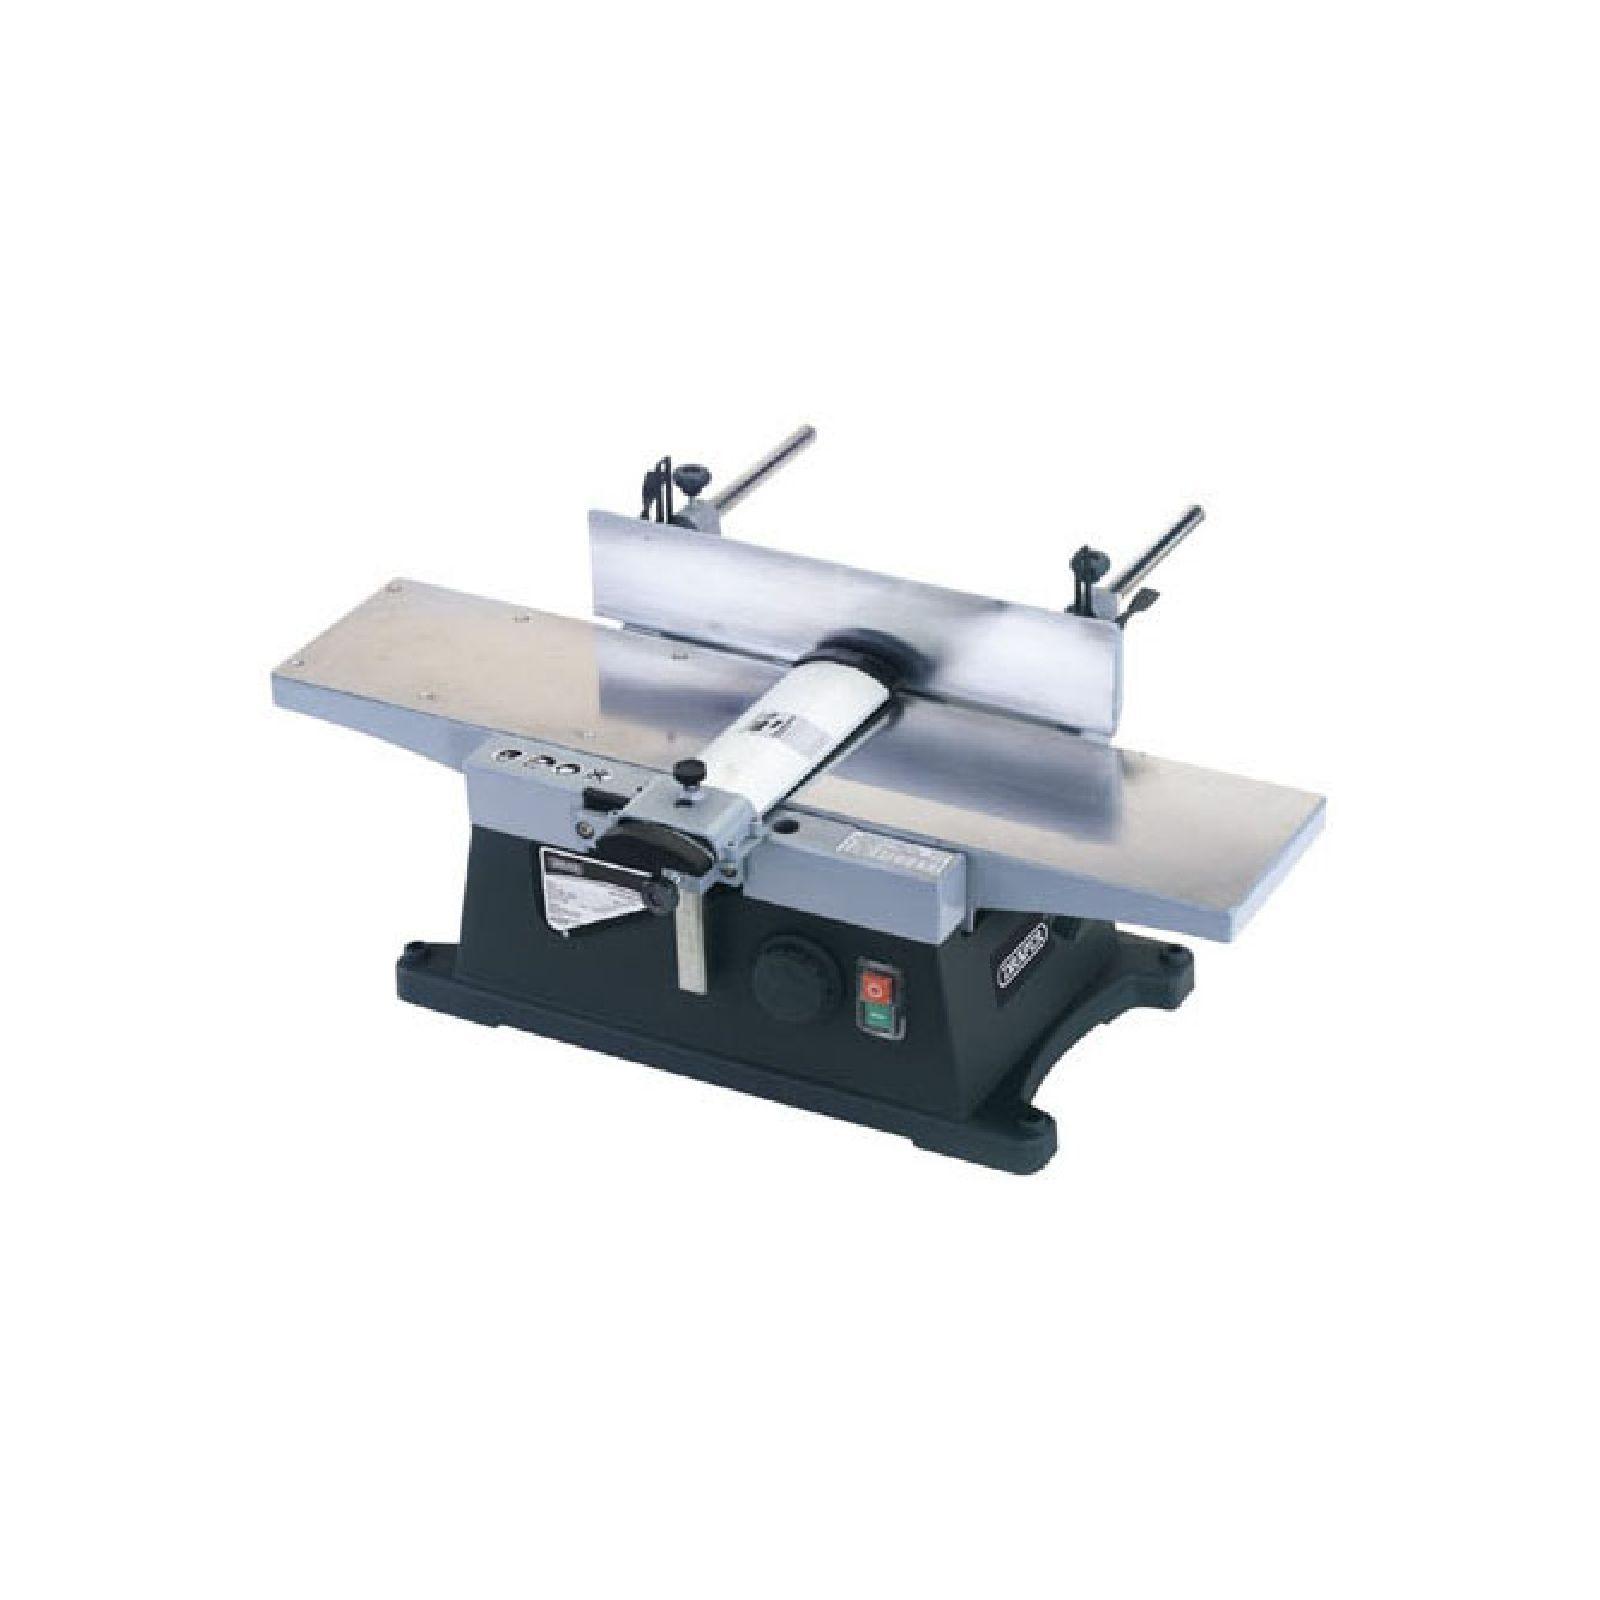 Draper 1x 1260w 230v bench planer garage professional standard tool 78941 ebay Bench planer